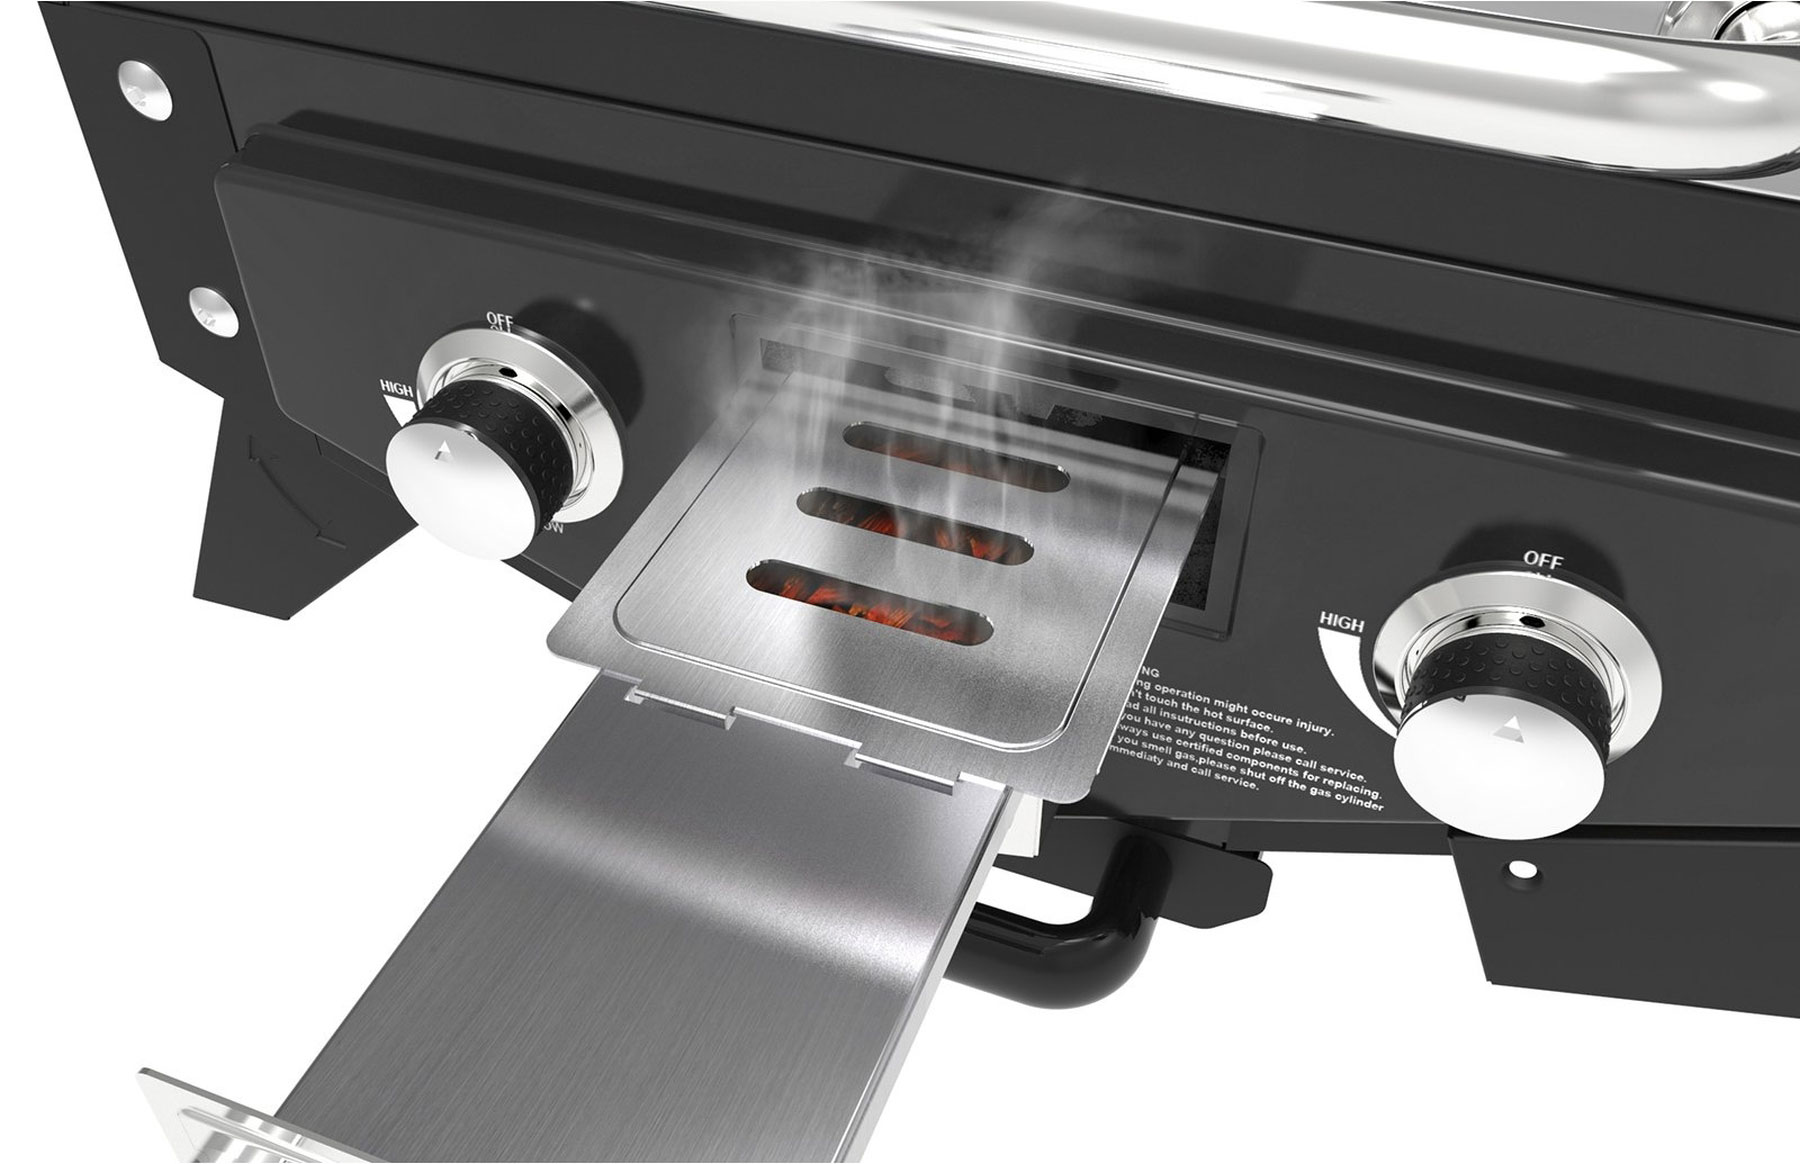 El Fuego Gasgrill / Tischgrill Medison silber Grillfläche 49x33,5cm Bild 8